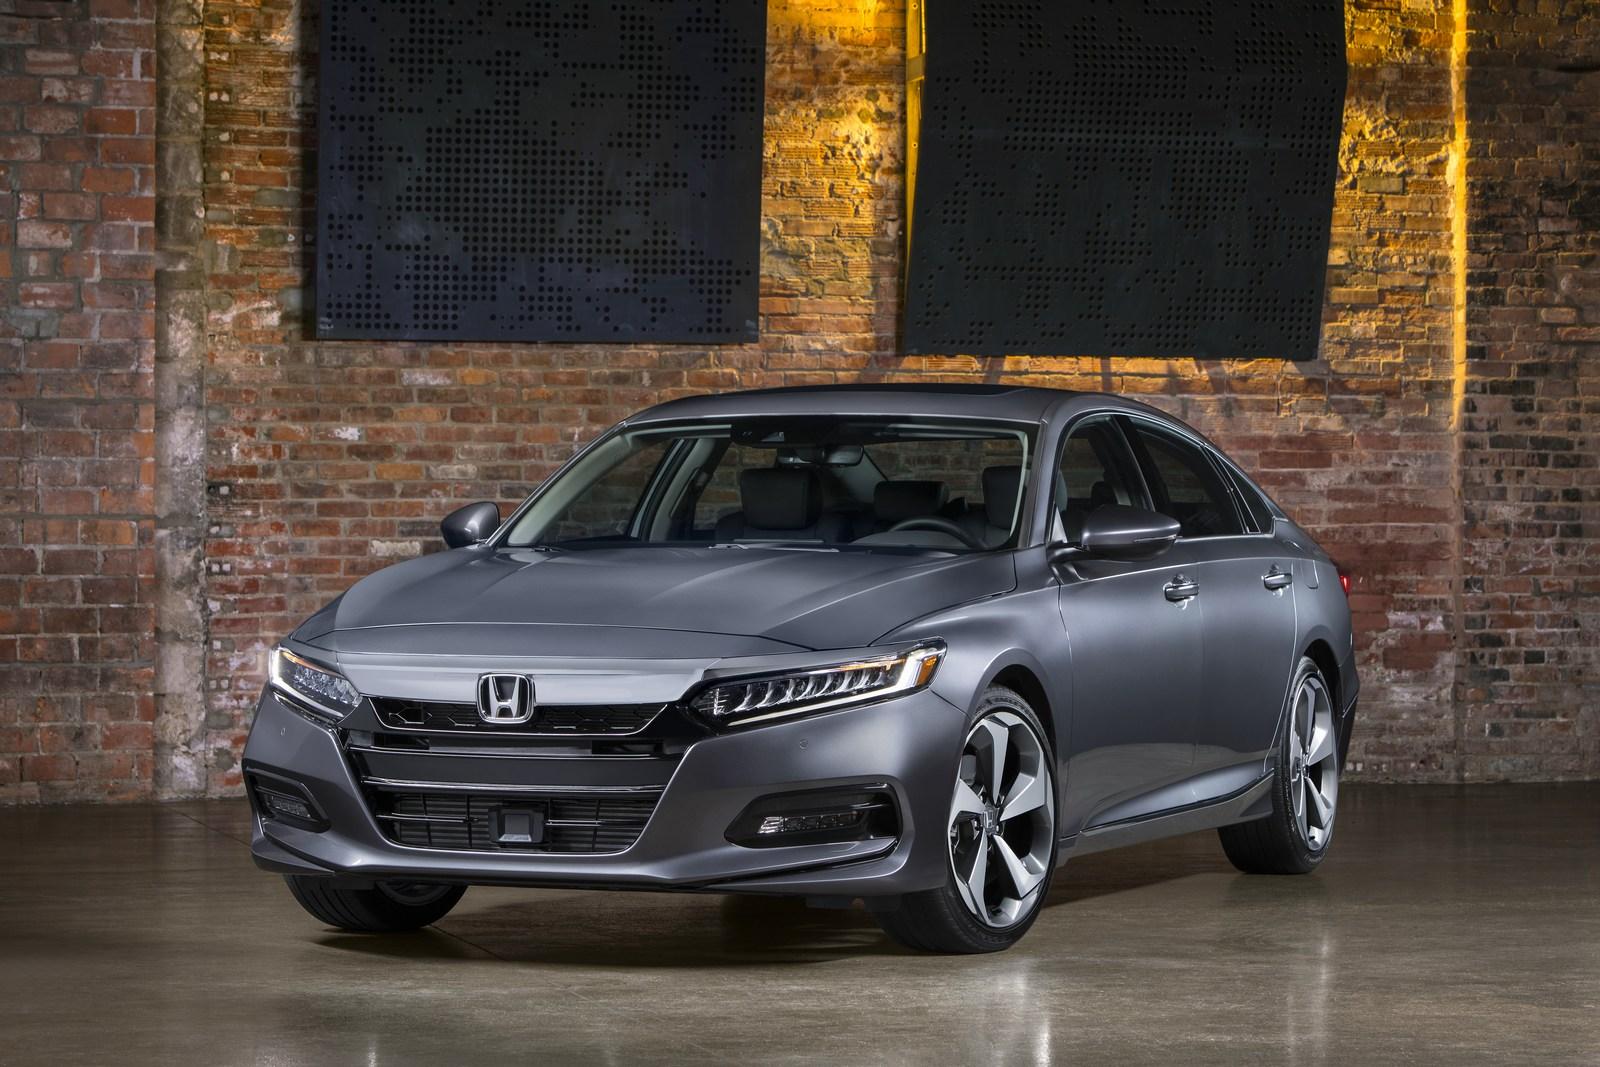 Honda-Accord-11